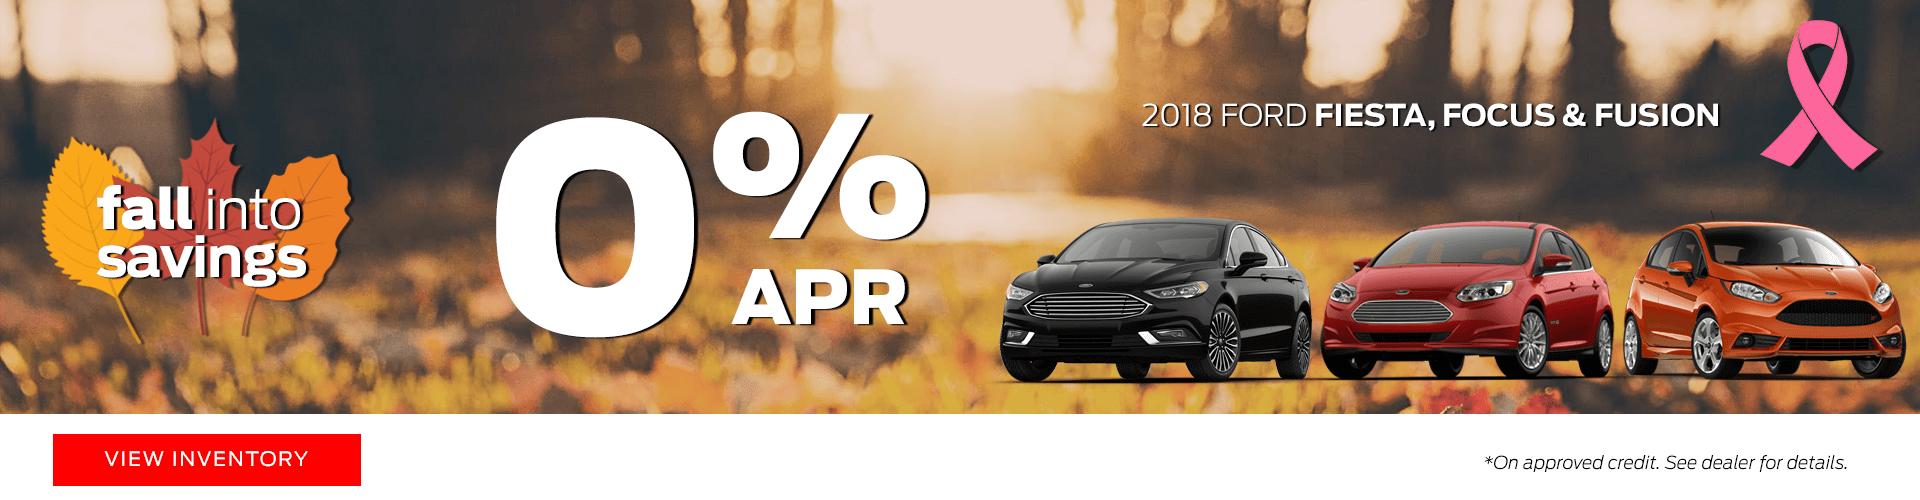 2018 Ford Fiesta, Fusion & Focus